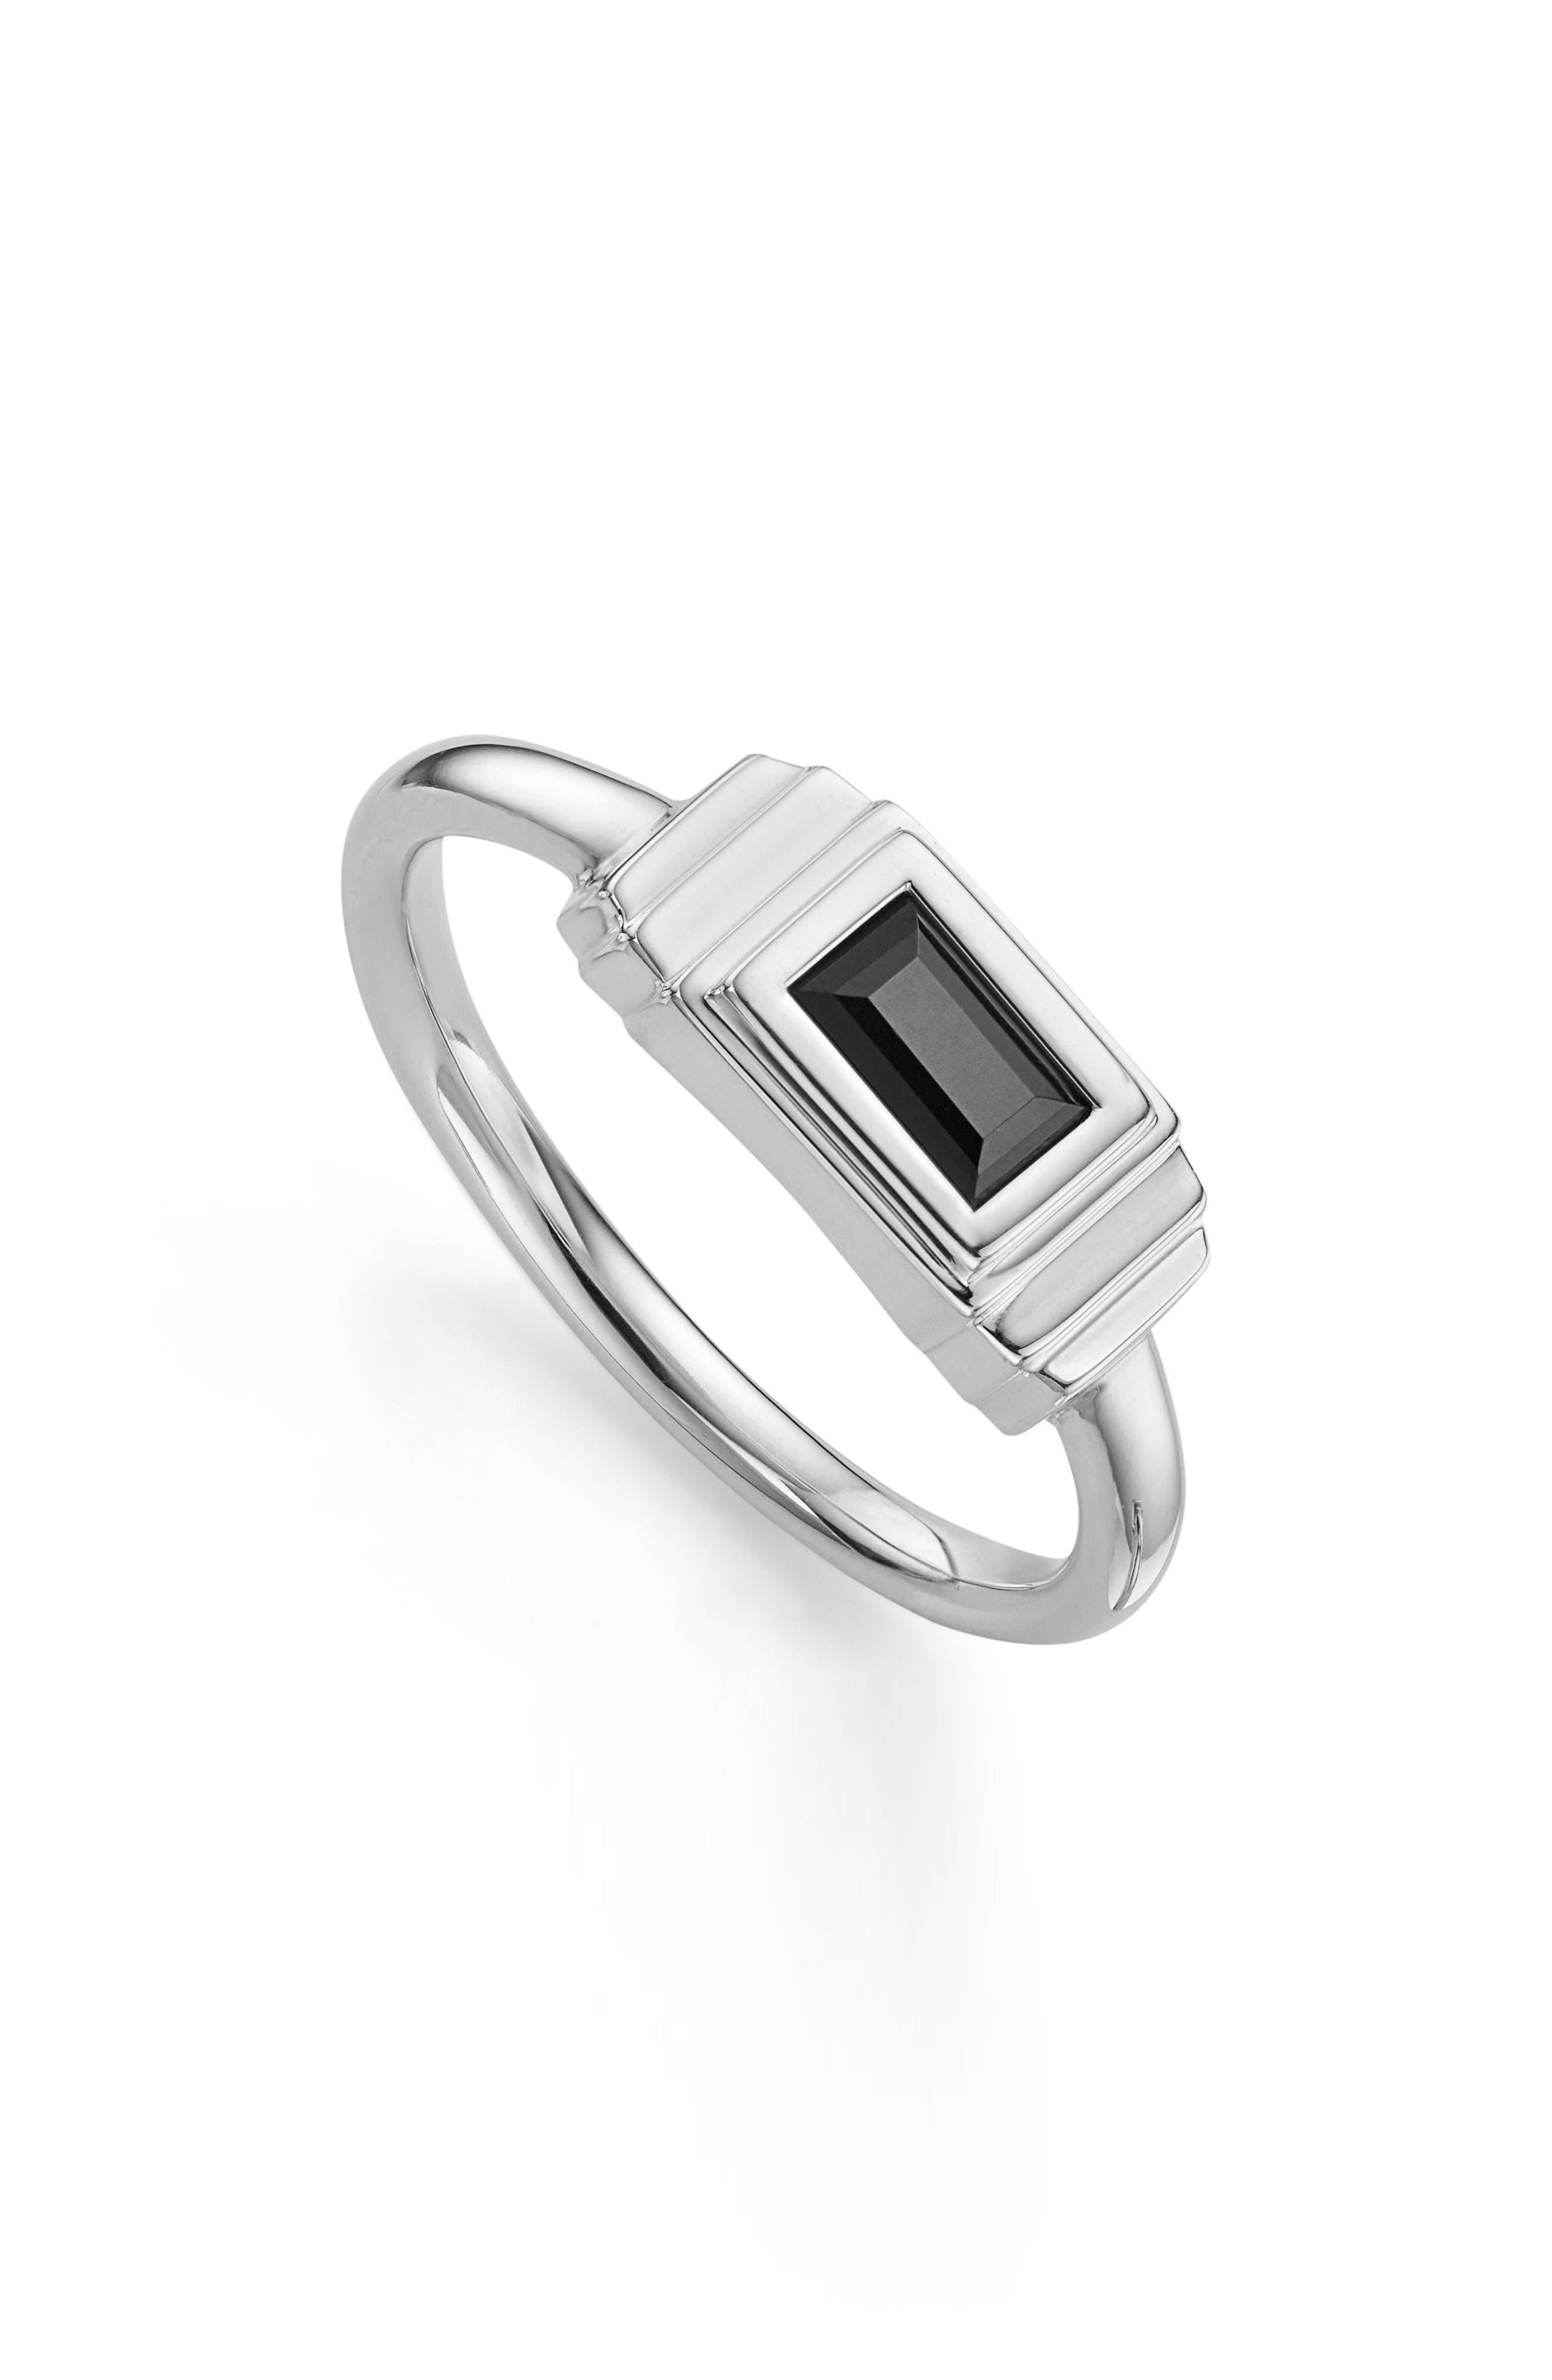 Baja Deco Semiprecious Stone Ring,                             Main thumbnail 1, color,                             Black Onyx/ Silver